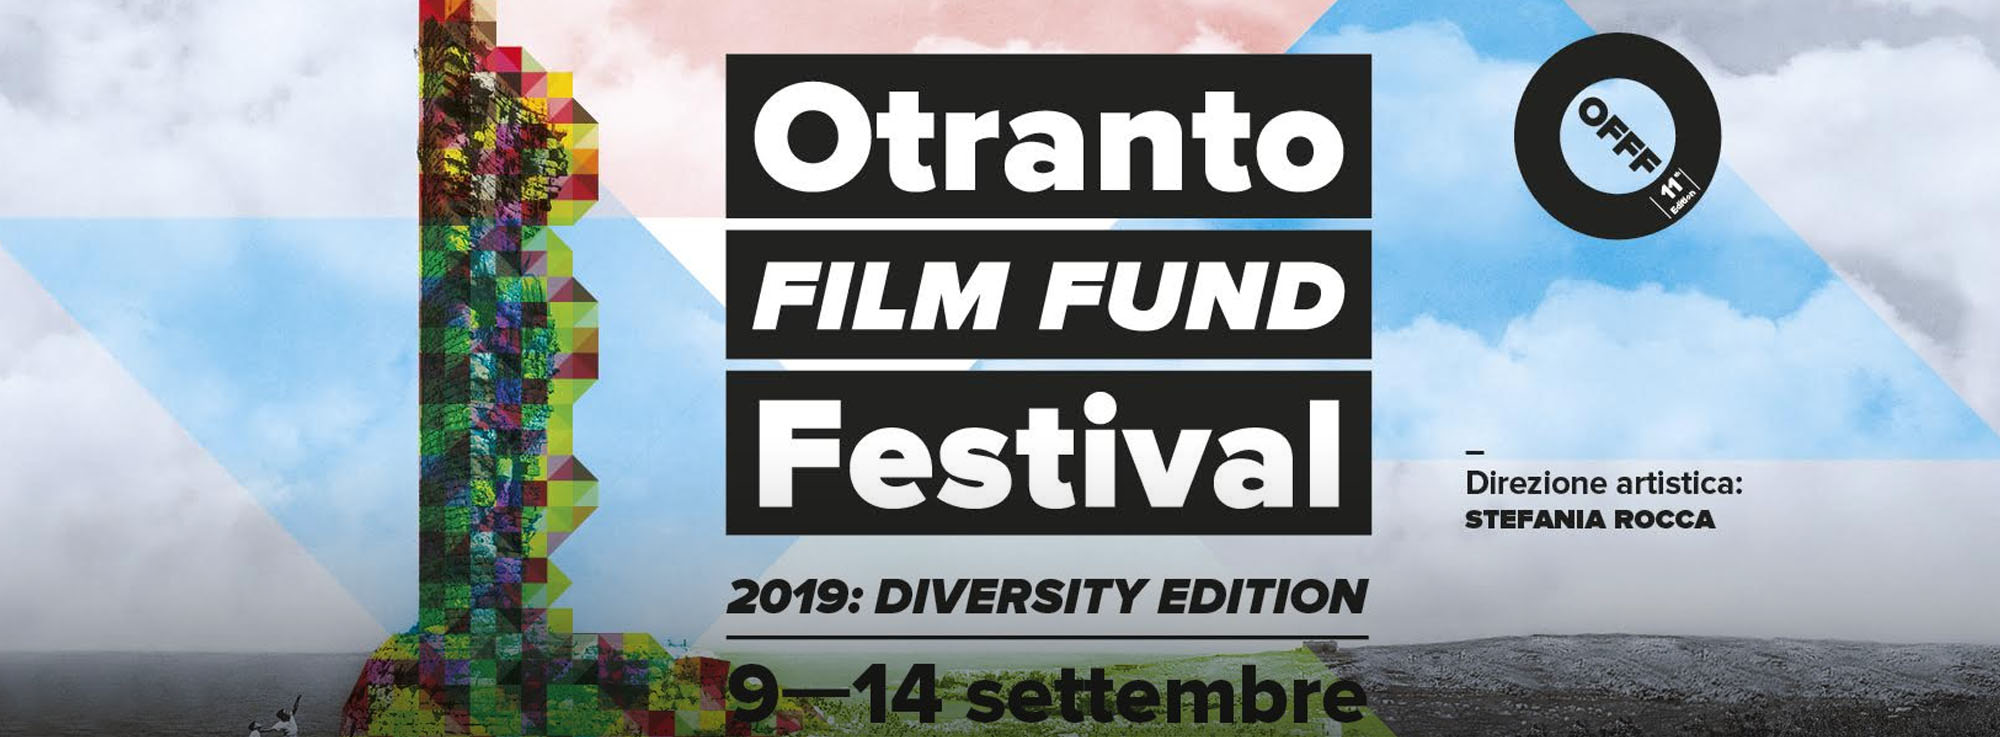 Otranto: Otranto Film Fund Festival